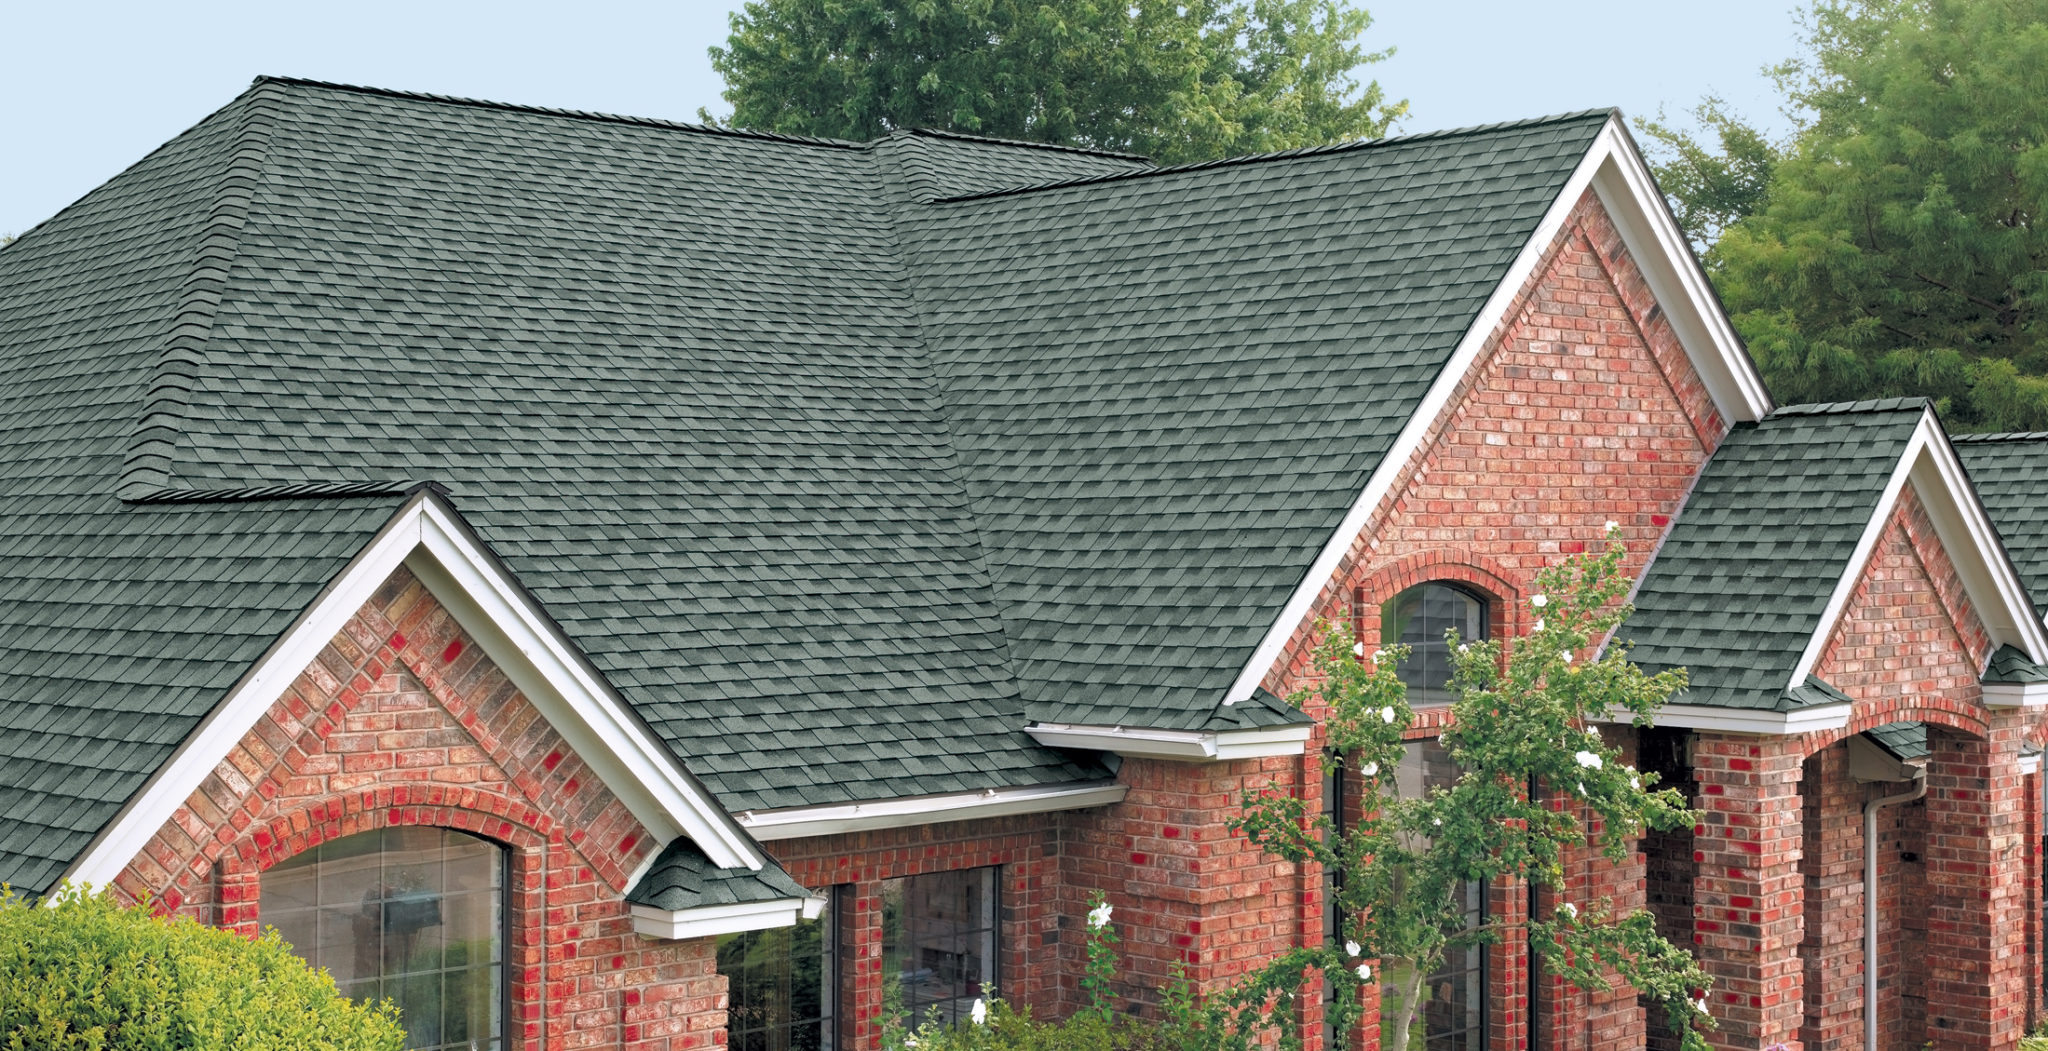 Roofing-Header-Image.jpg